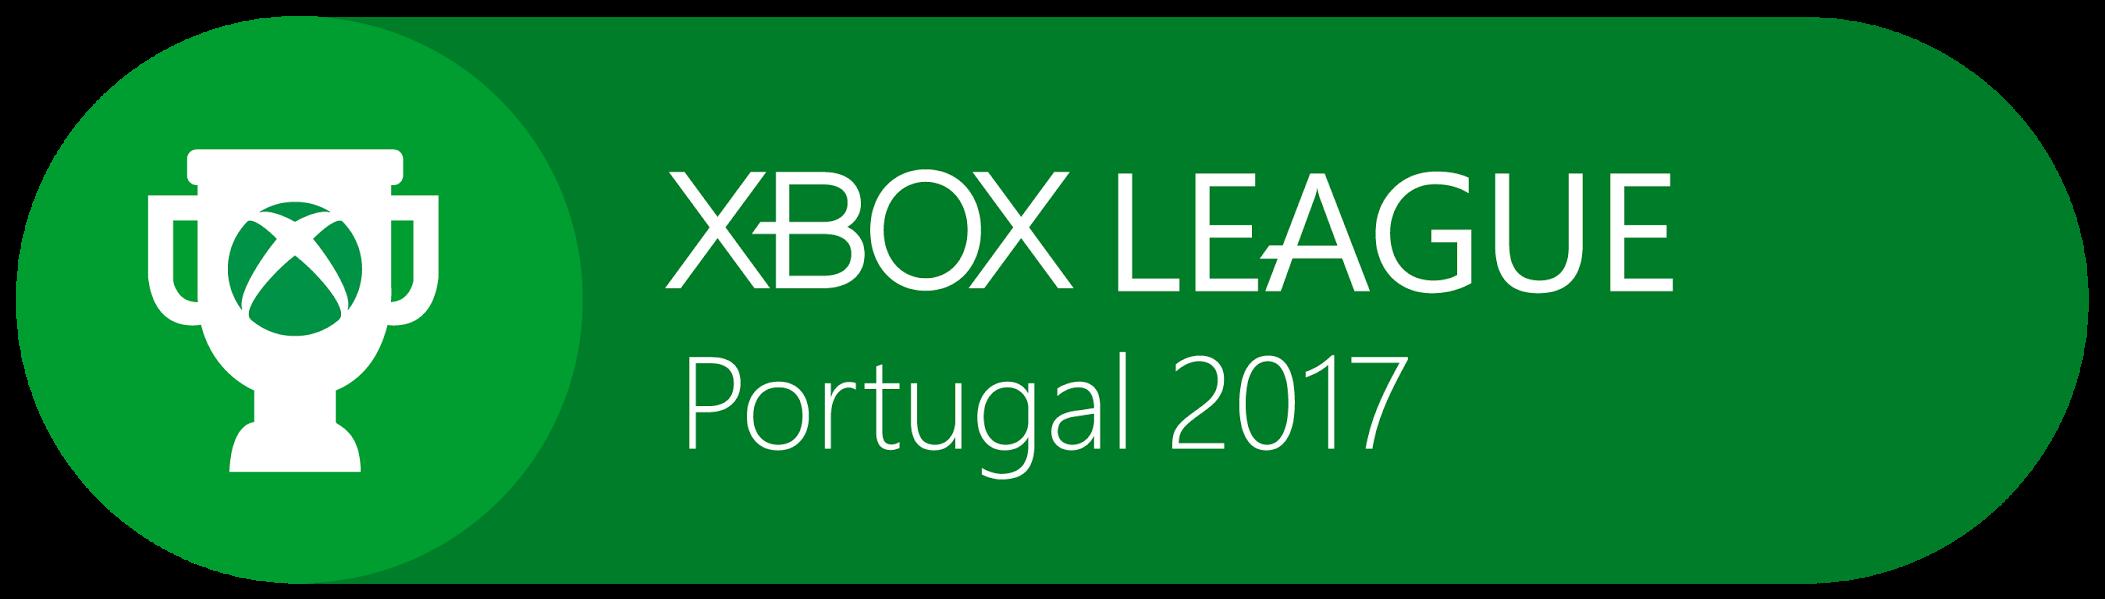 XBOX League